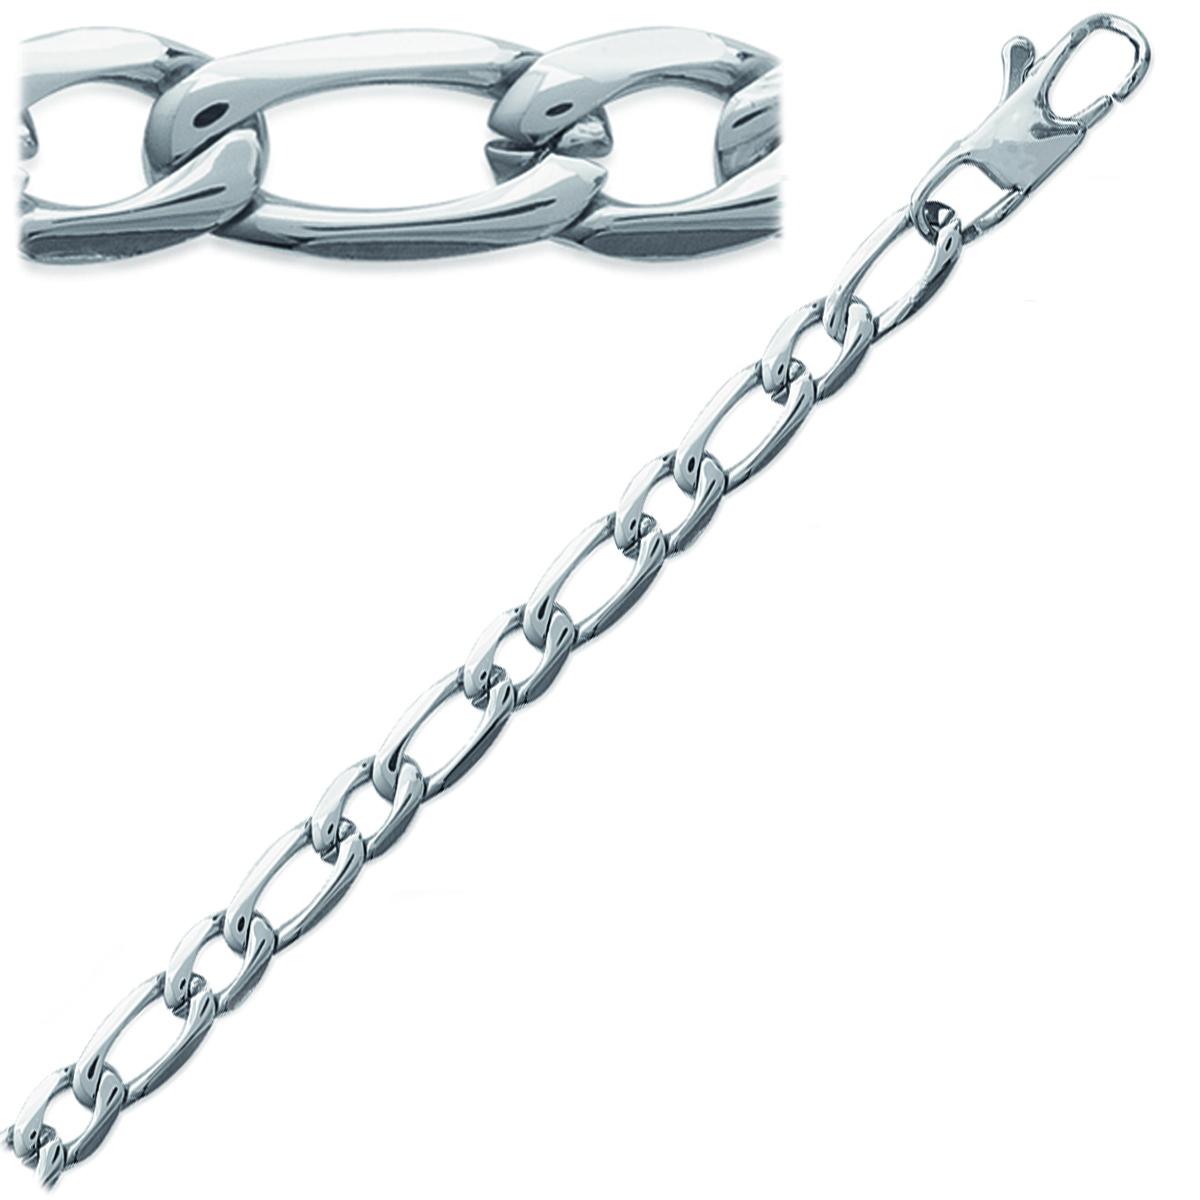 Bracelet Acier \'Maille Figaro\' argenté - 21 cm 5 mm  - [J9354]